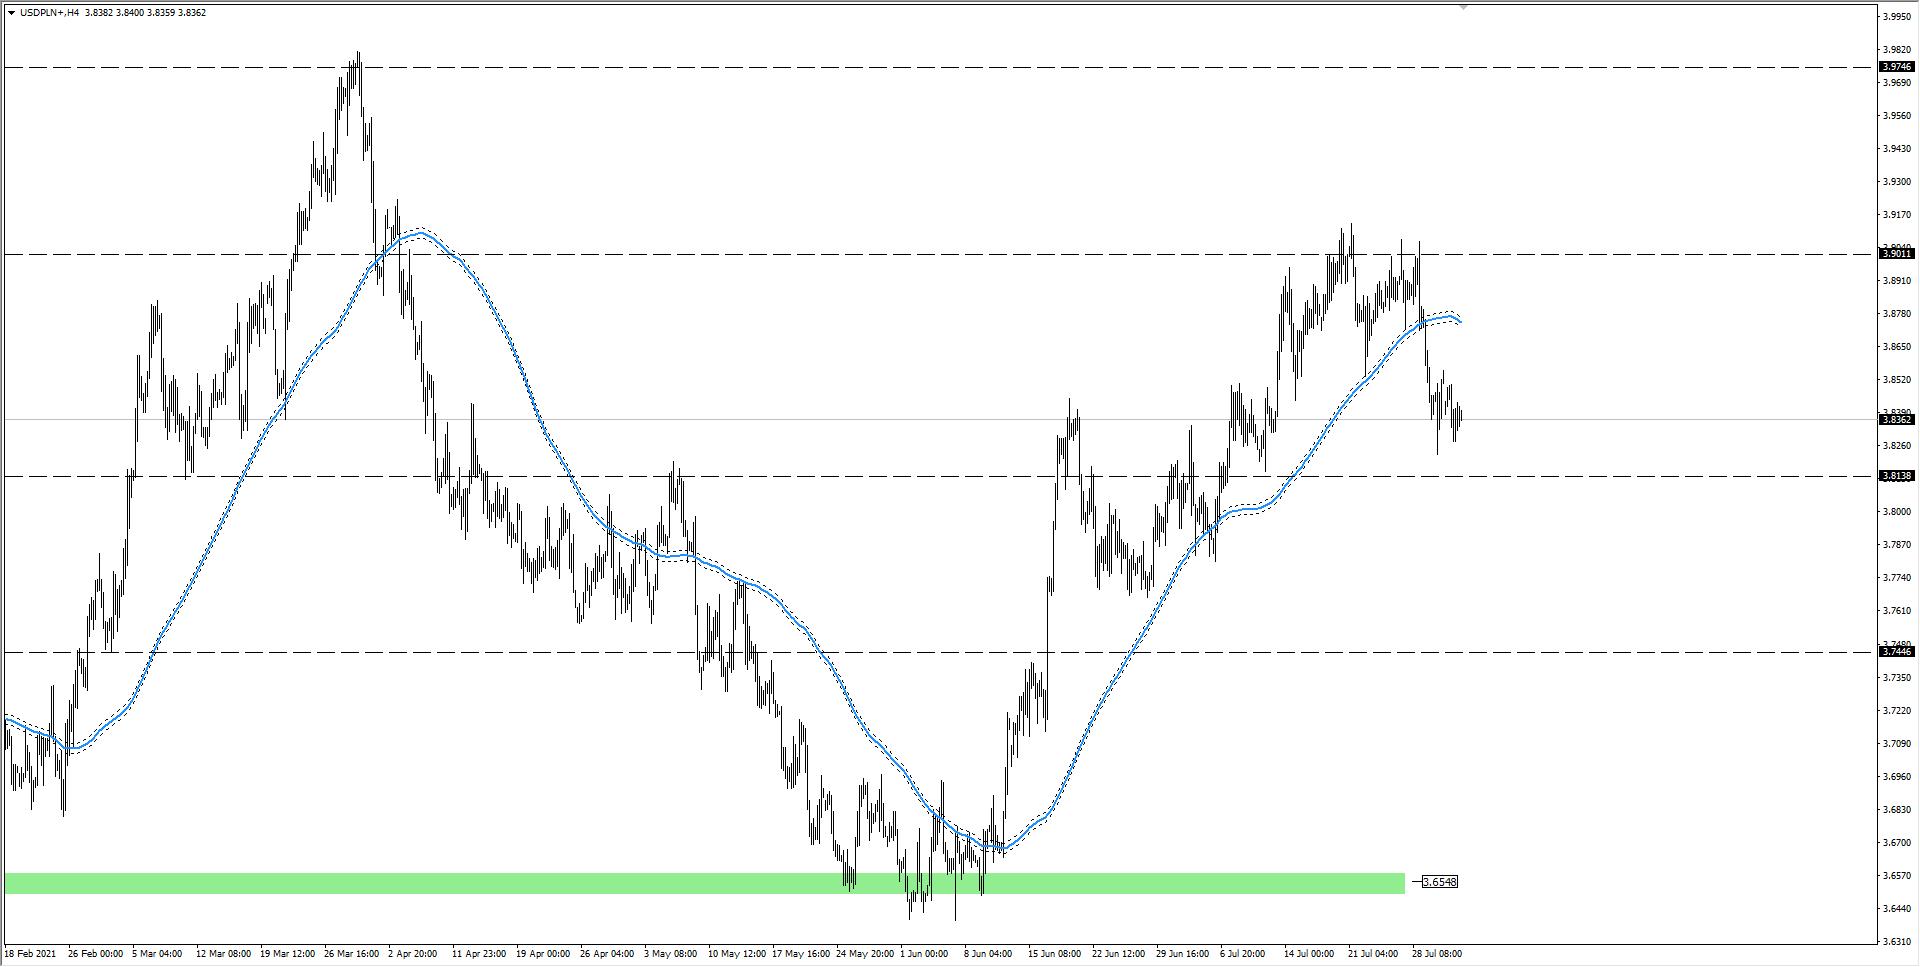 wykres Kurs dolara USD/PLN H4 03.08.2021